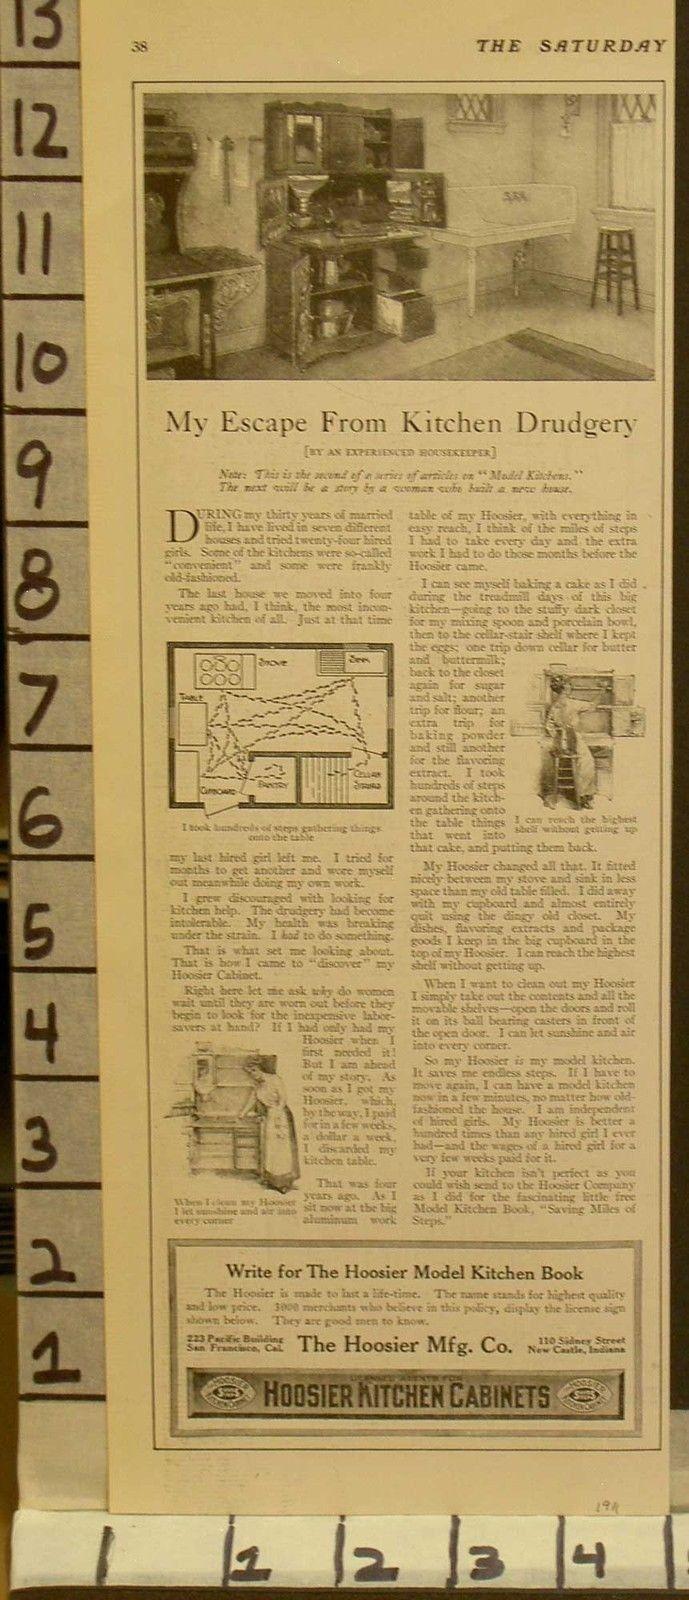 1911 HOOSIER KITCHEN CABINET HOME DESIGN LAYOUT HEH COOK HOUSE  2322523225